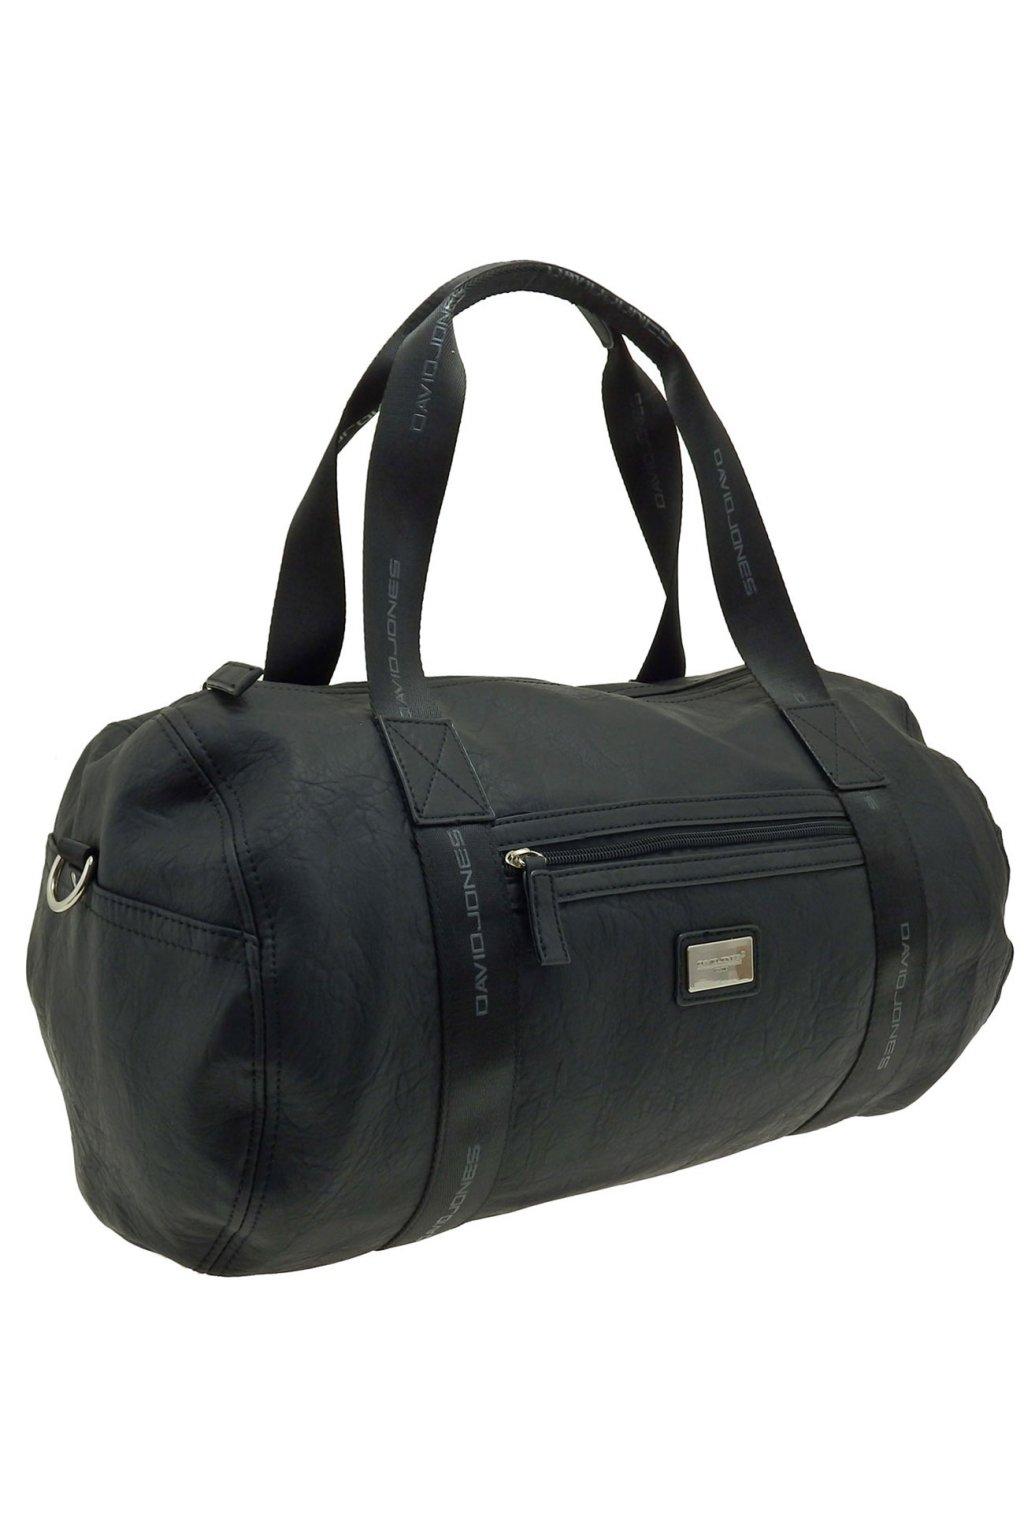 cestovni taska ct10 cm5081 c